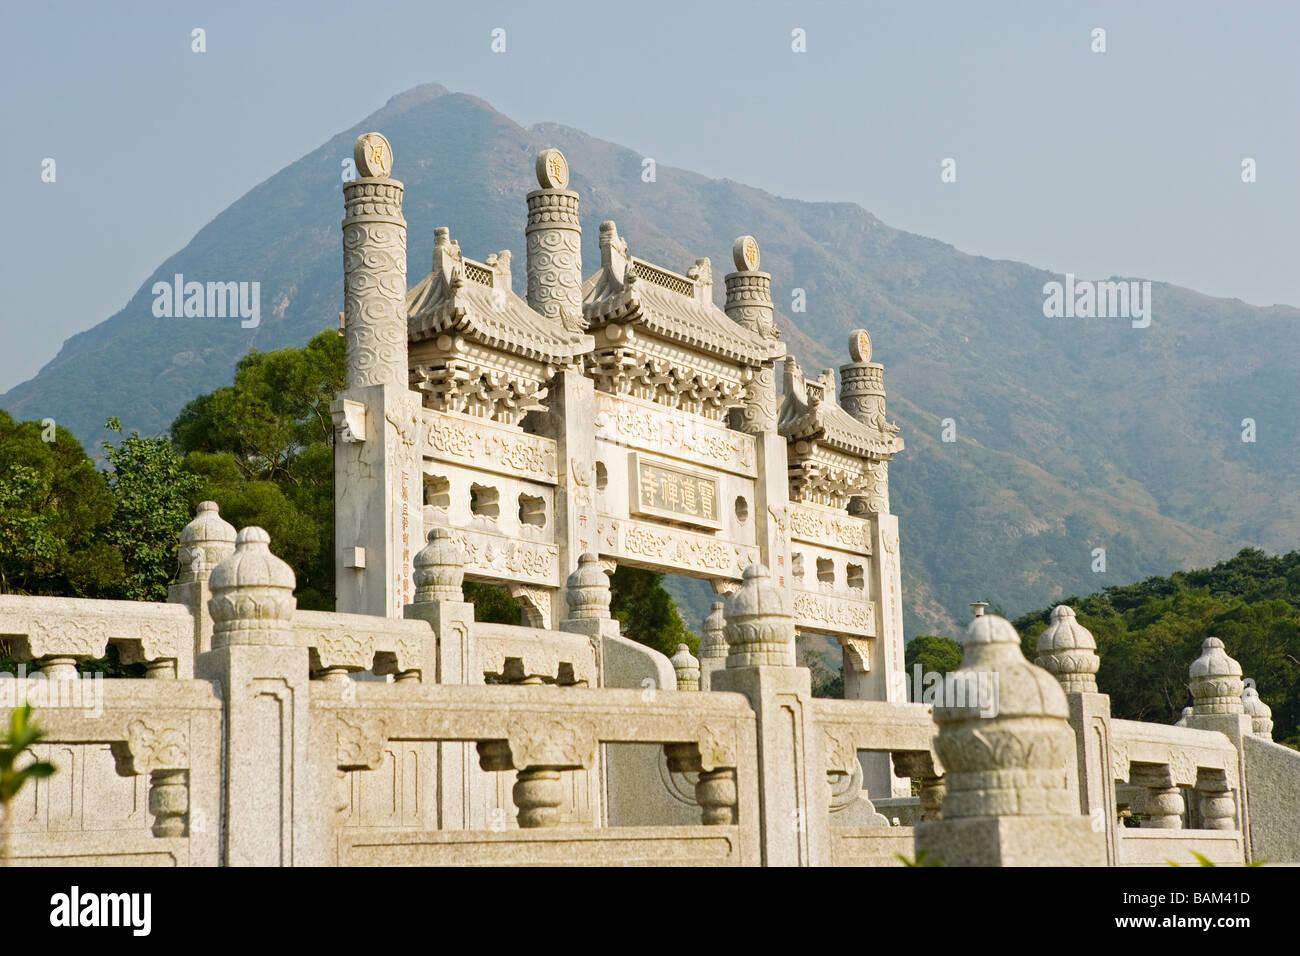 Po lin monastery lantau island - Stock Image